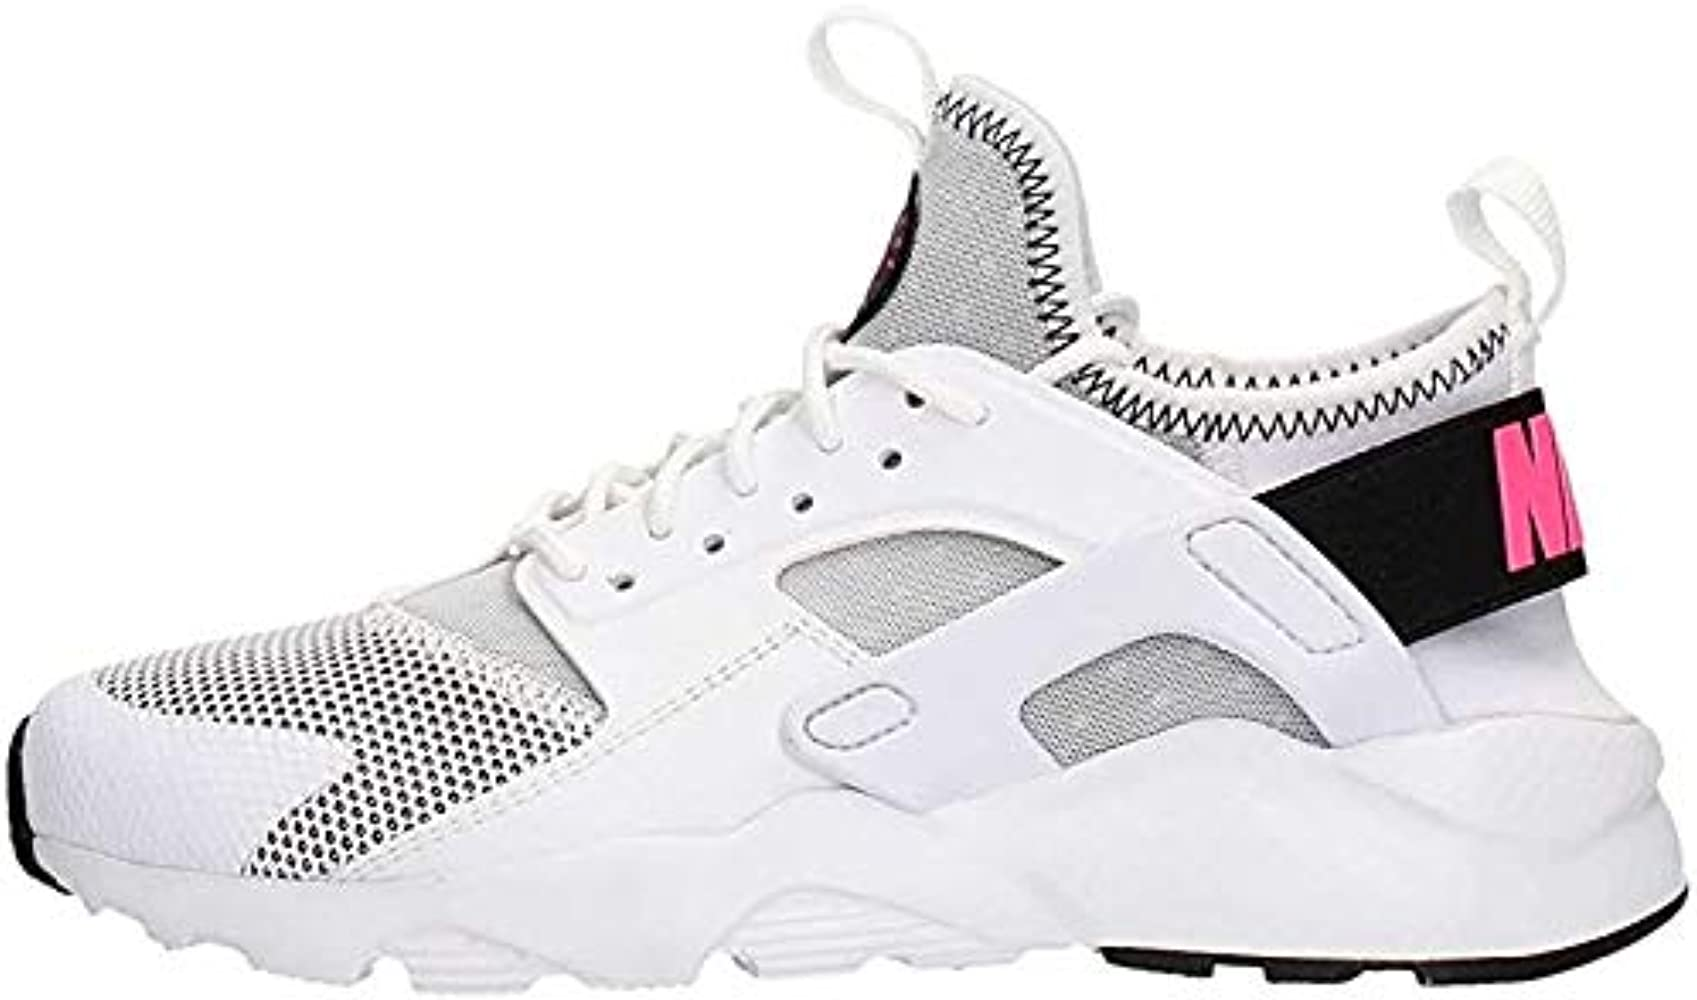 Nike - Huarache Run Ultra (GS) White